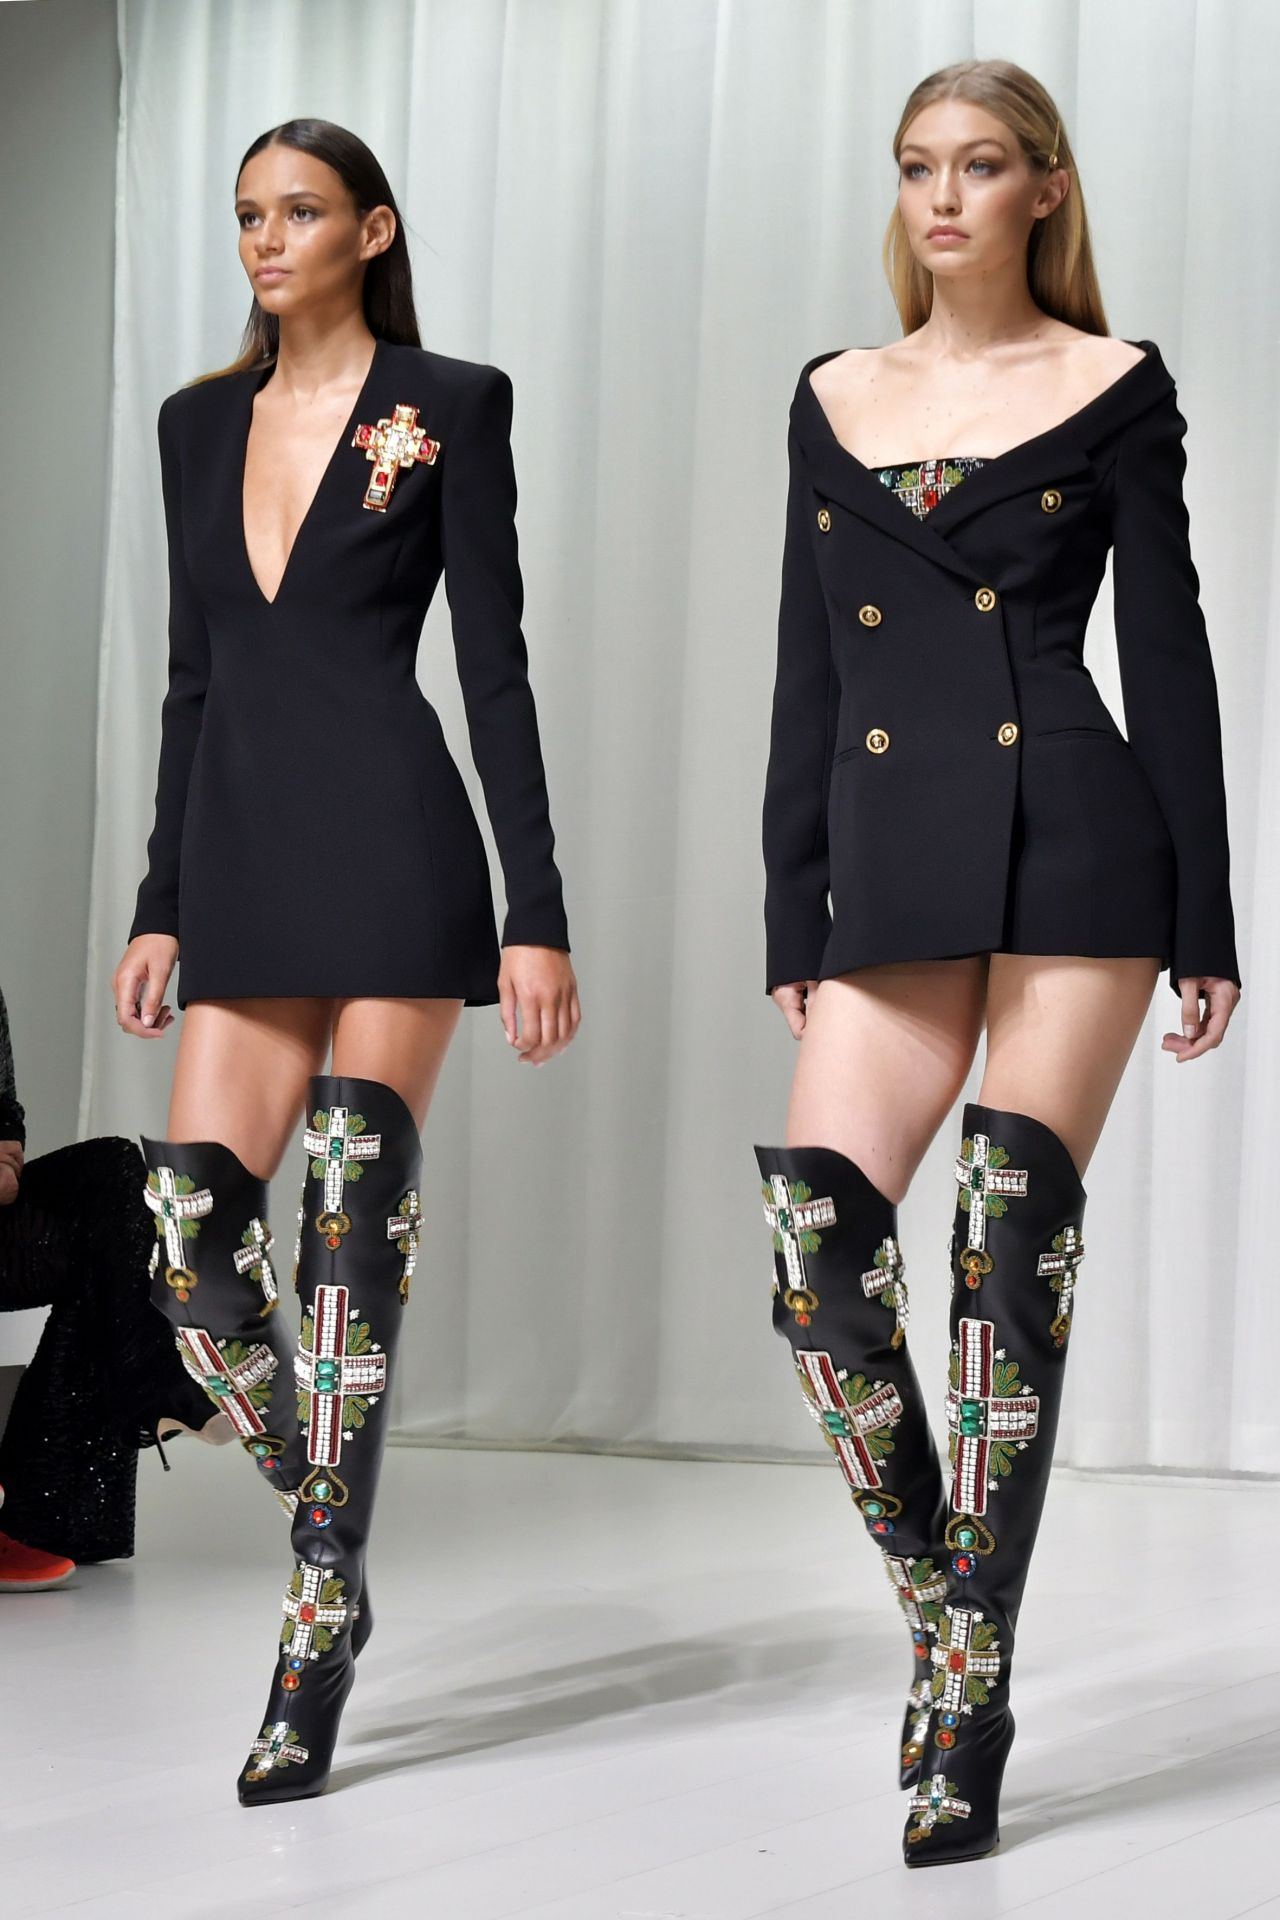 Gigi Hadid Versace Show In Milan 09 22 2017